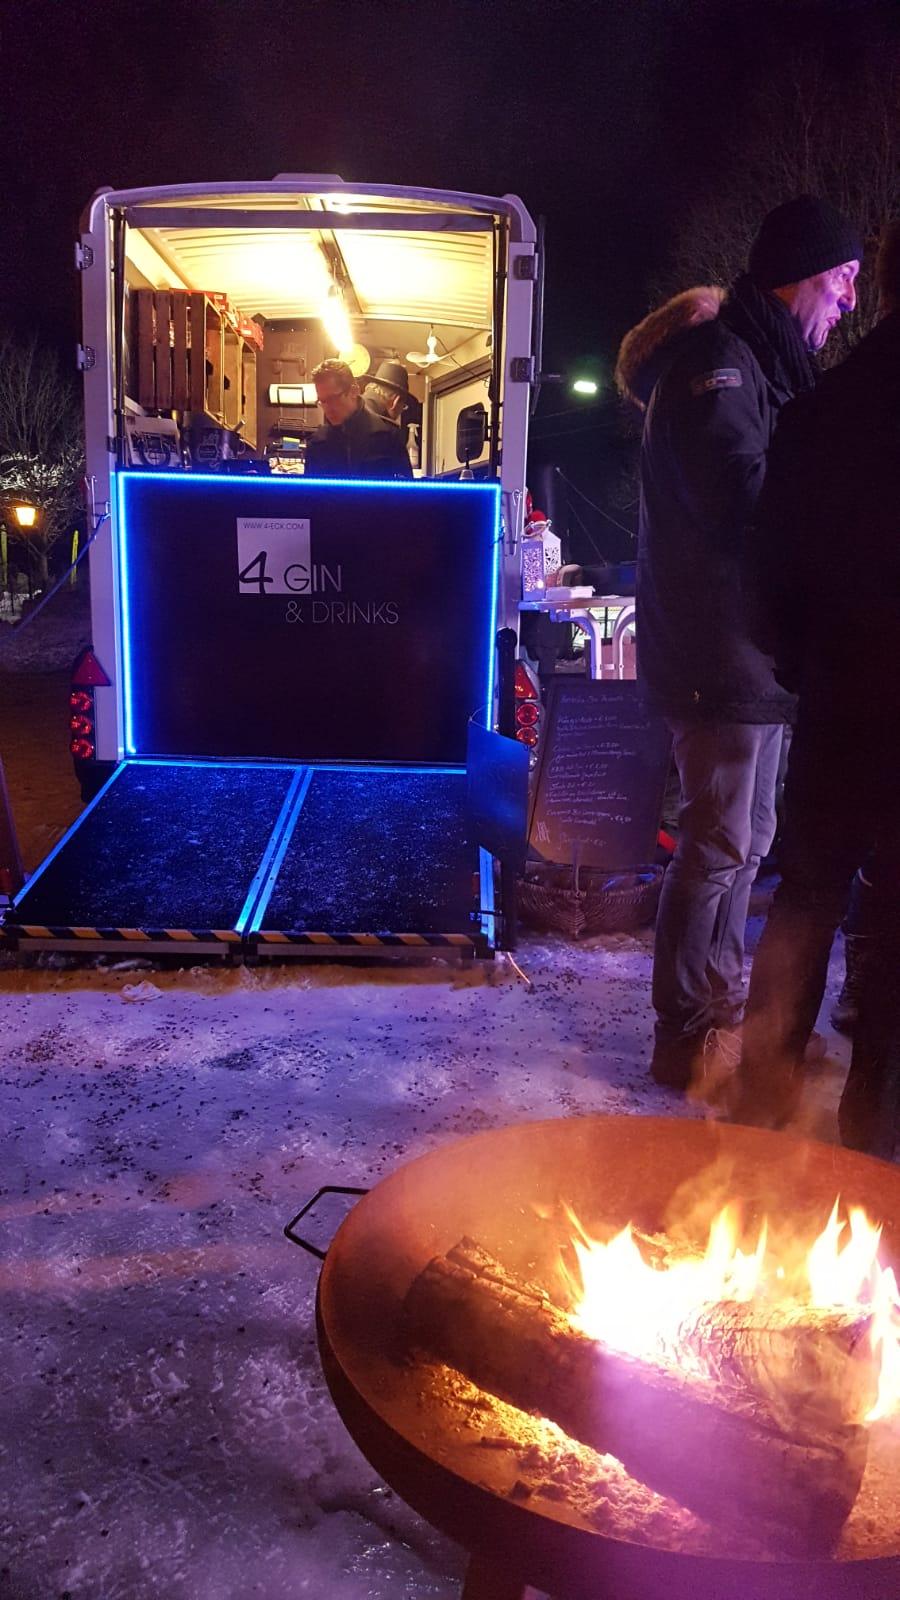 Wintercocktailnacht, 4 Gin and Drinks, Horseboxbar, Event-Bar, mobile Bar, Bayern, Garmisch-Partenkirchen, Gin-Bar, Oberammergau, König-Ludwig-Lauf by Uschi Glas 4 weddings and events